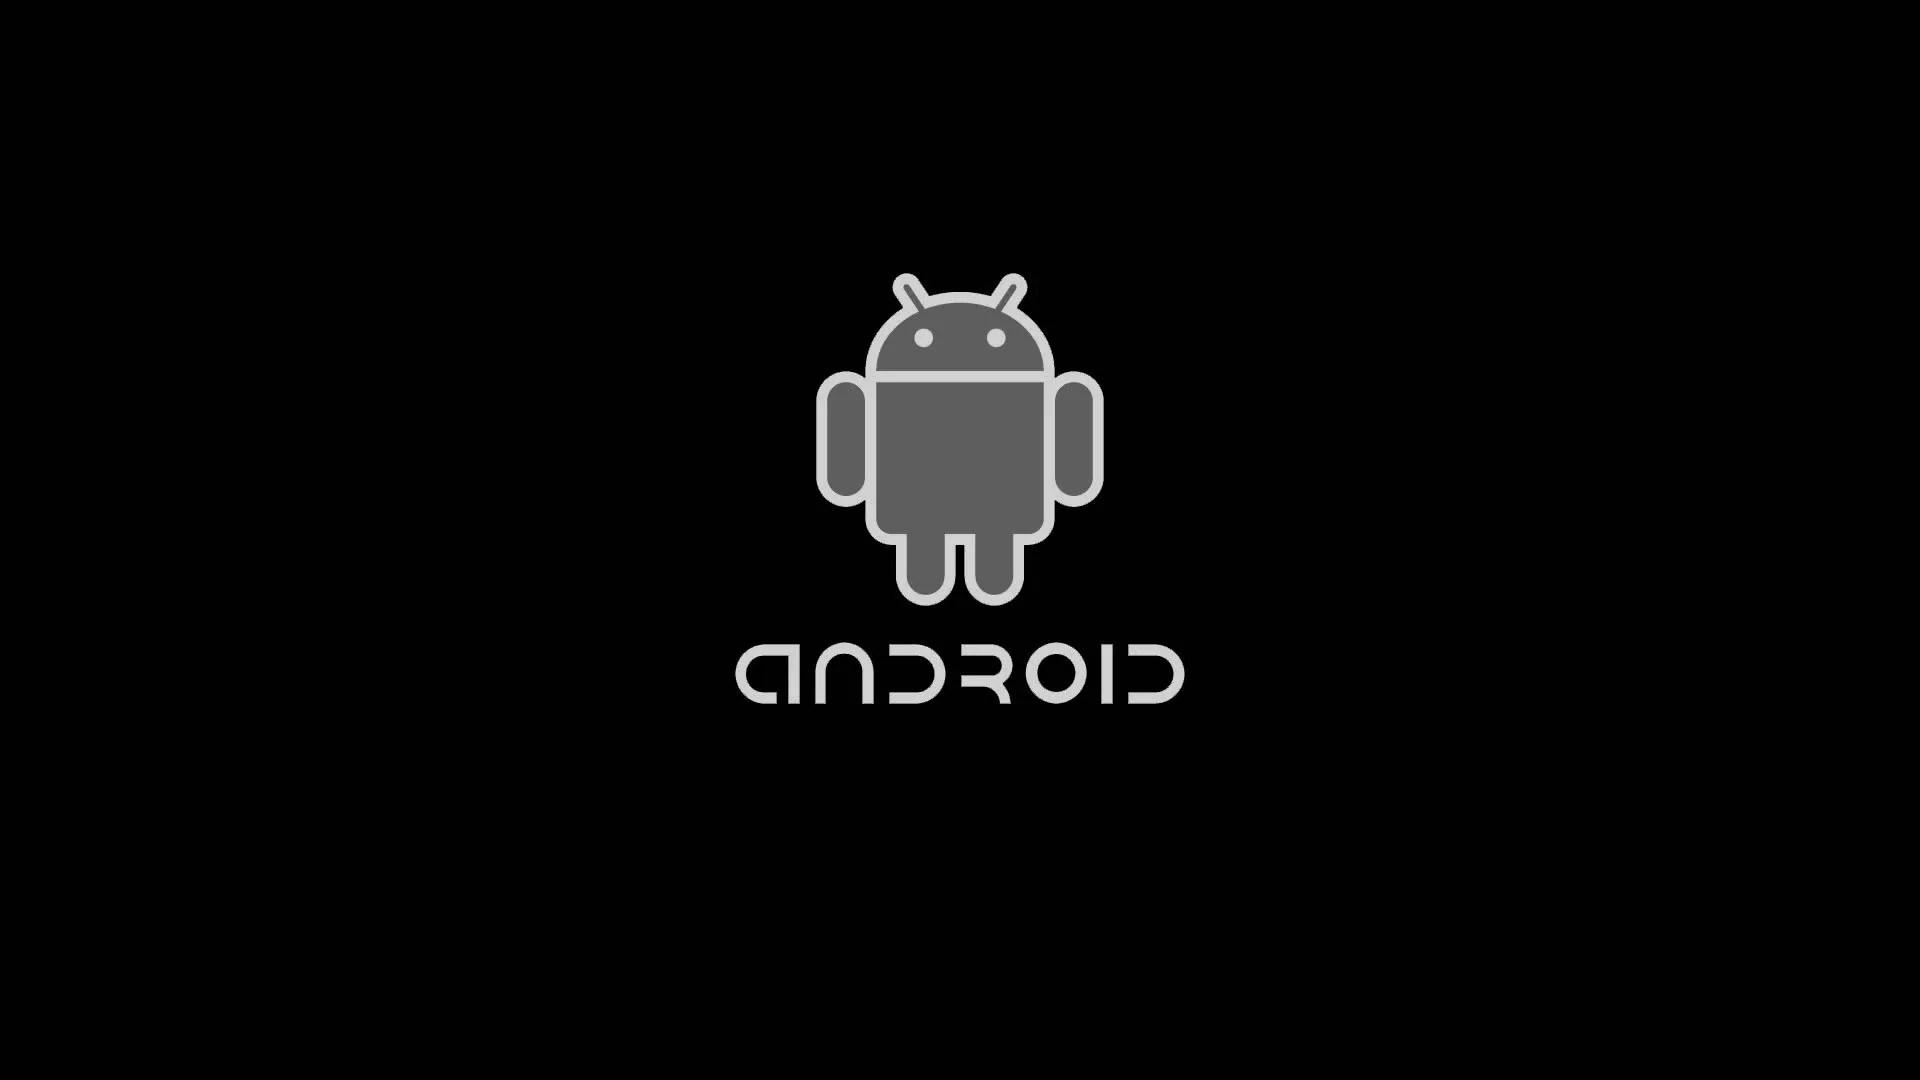 Android logo Black Wallpaper